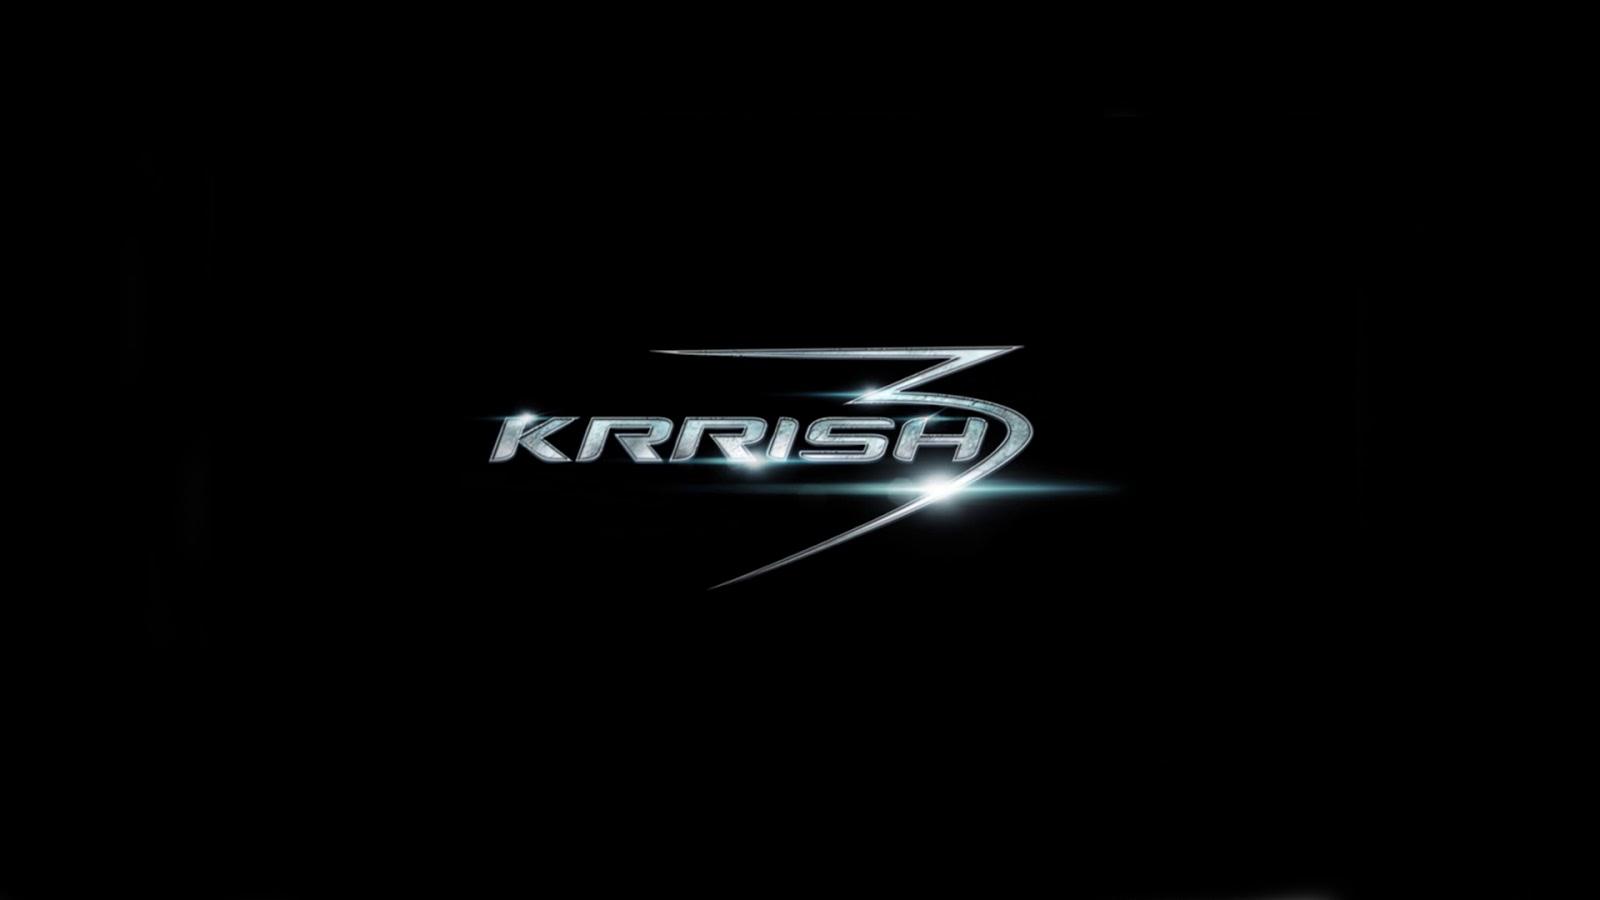 Krrish 3 Latest Hd Wallpapers 1080p